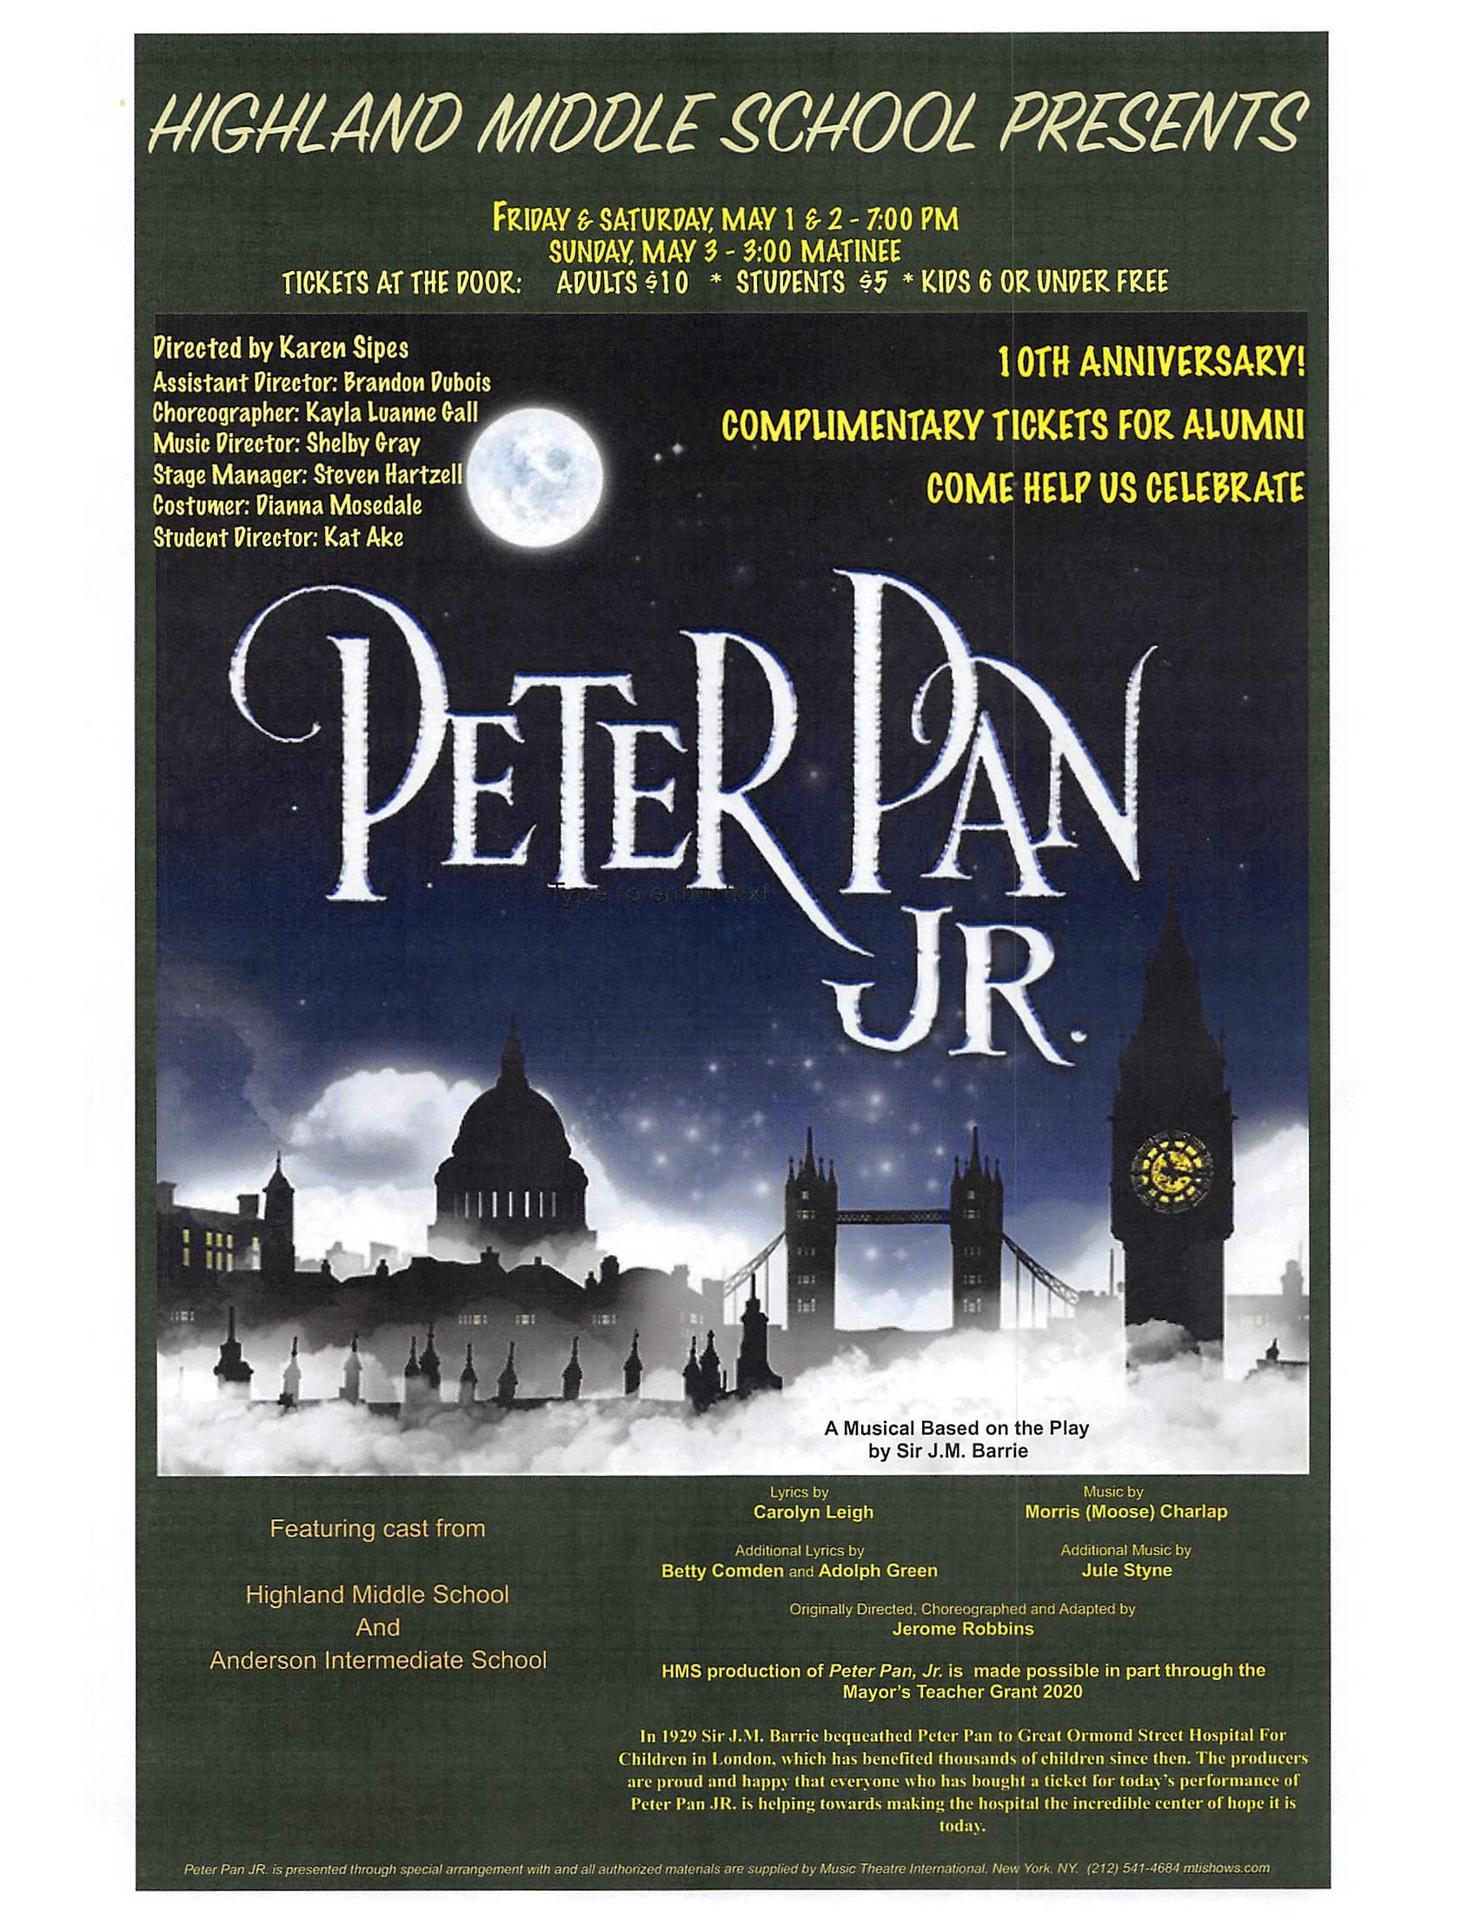 Peter Pan, Jr. (the musical)